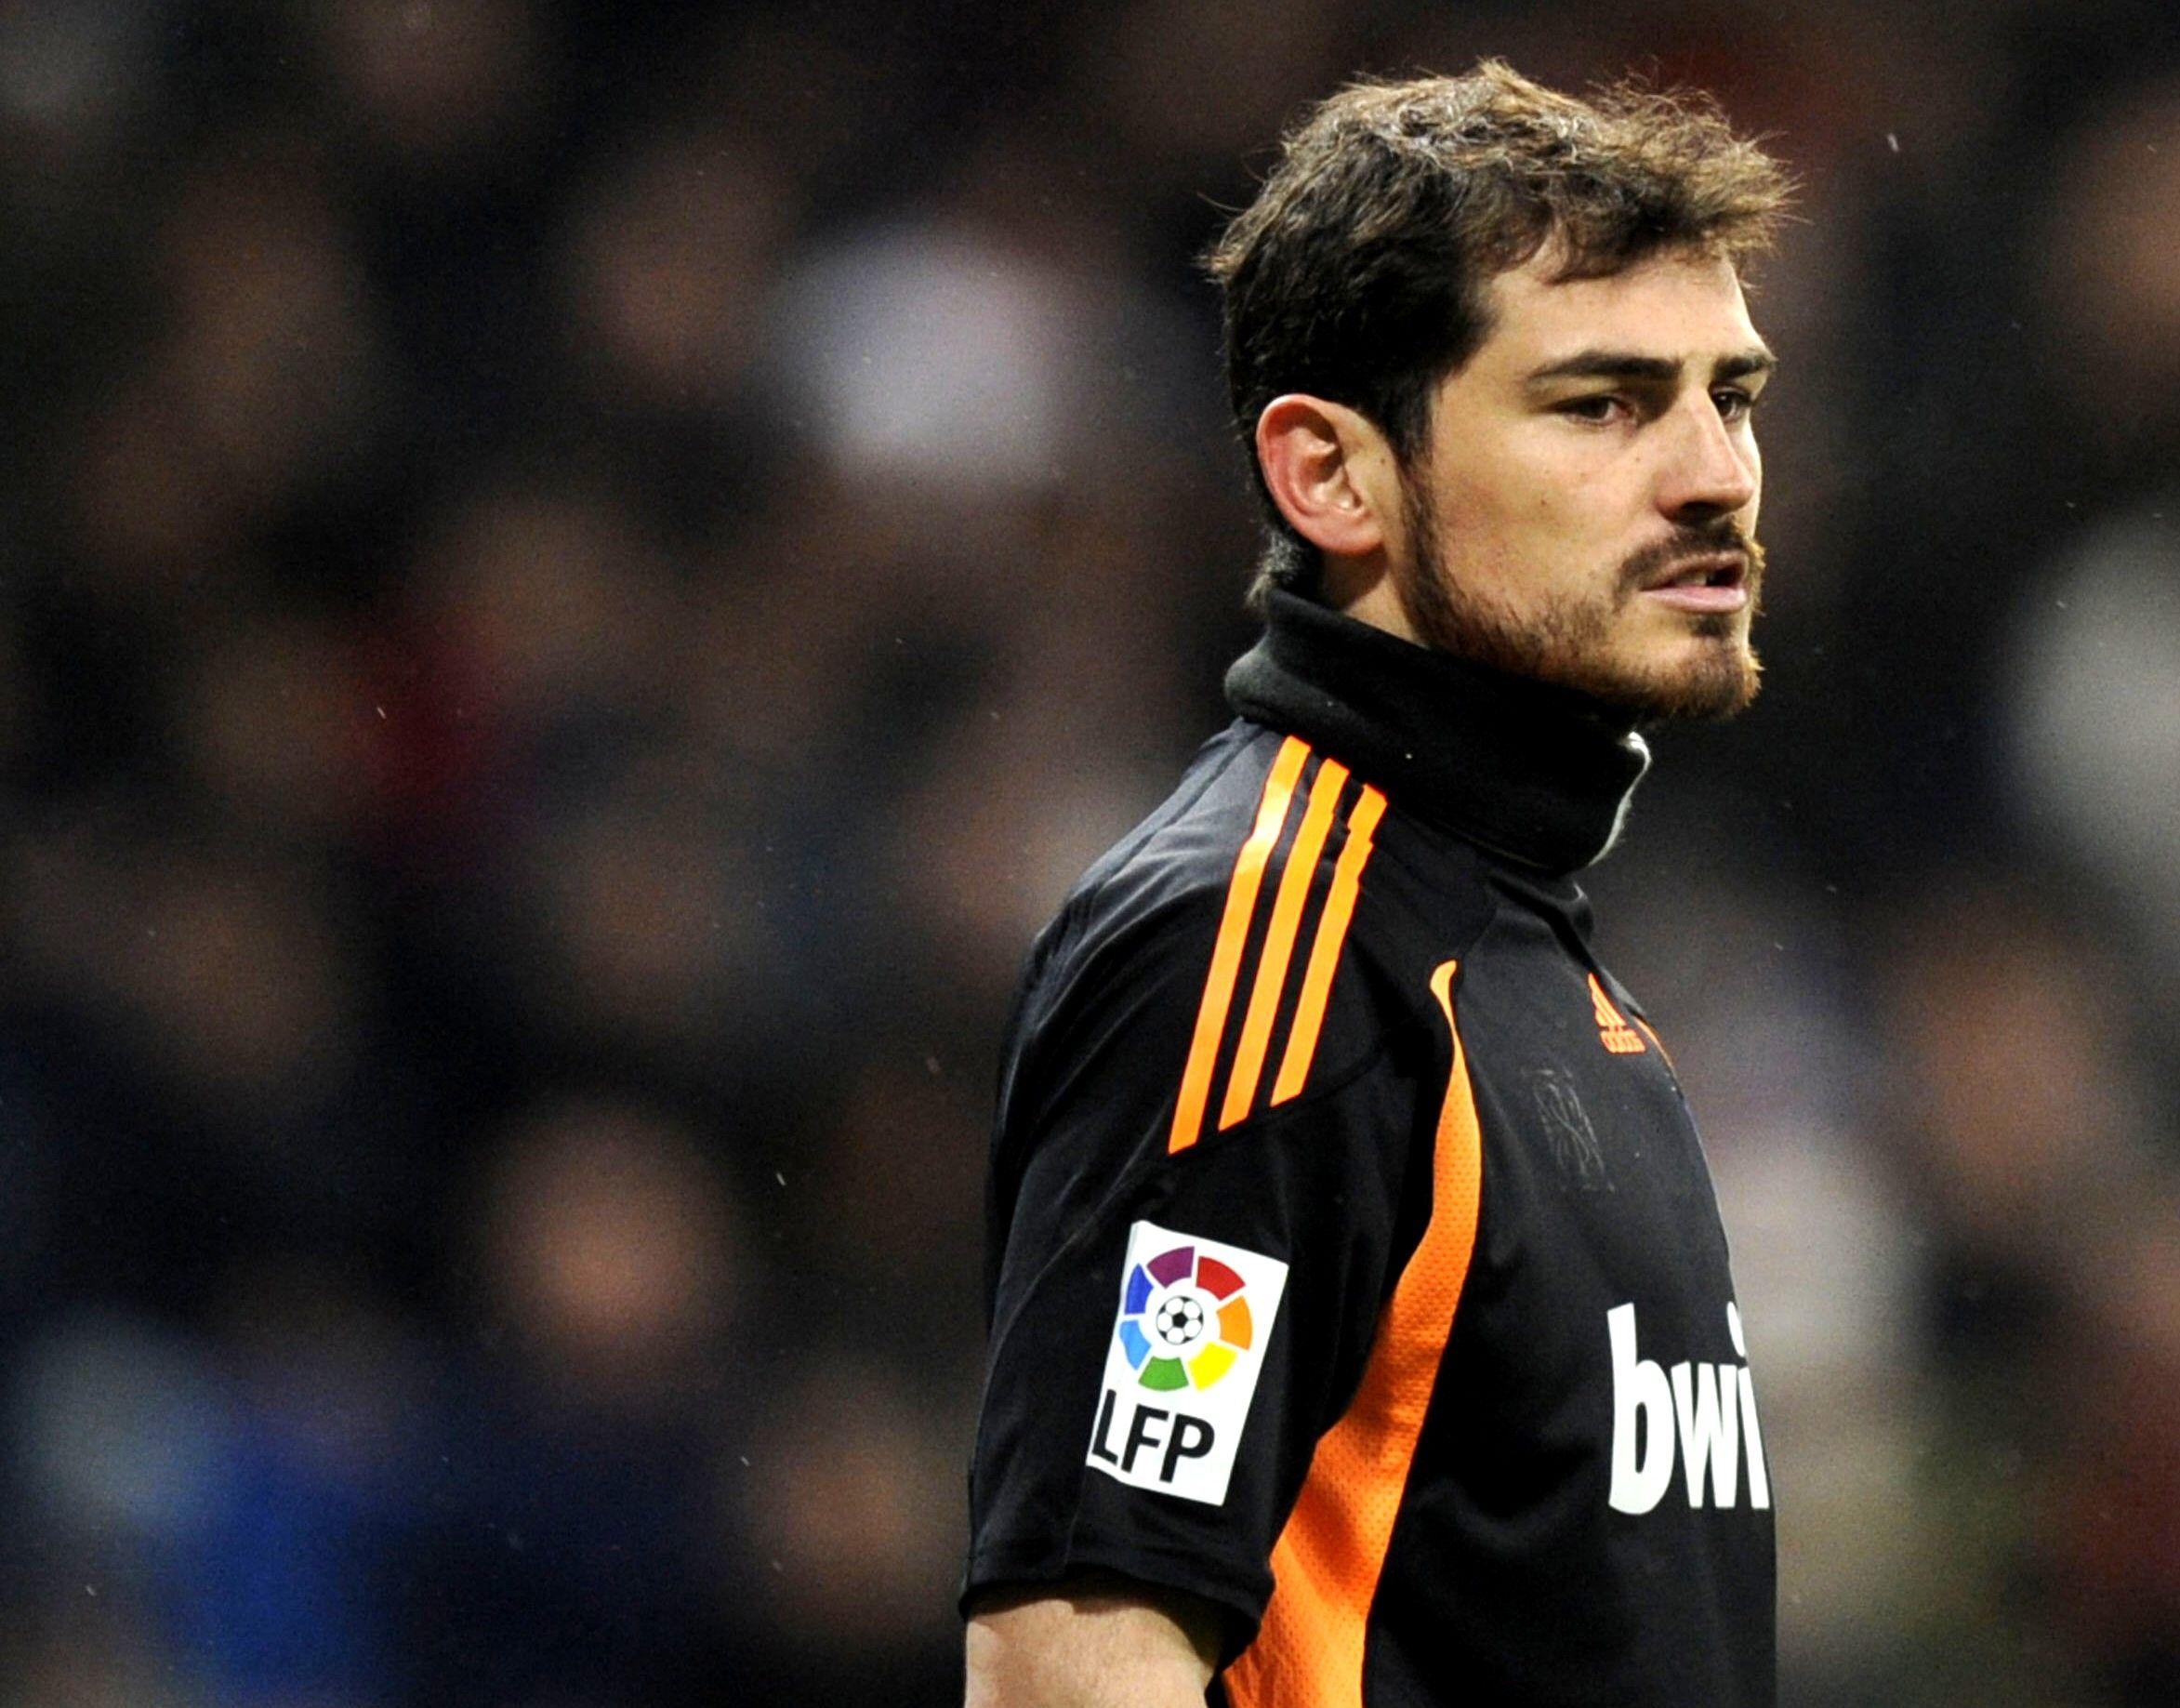 Iker Casillas Football Player Real Madrid Wallpaper Photo